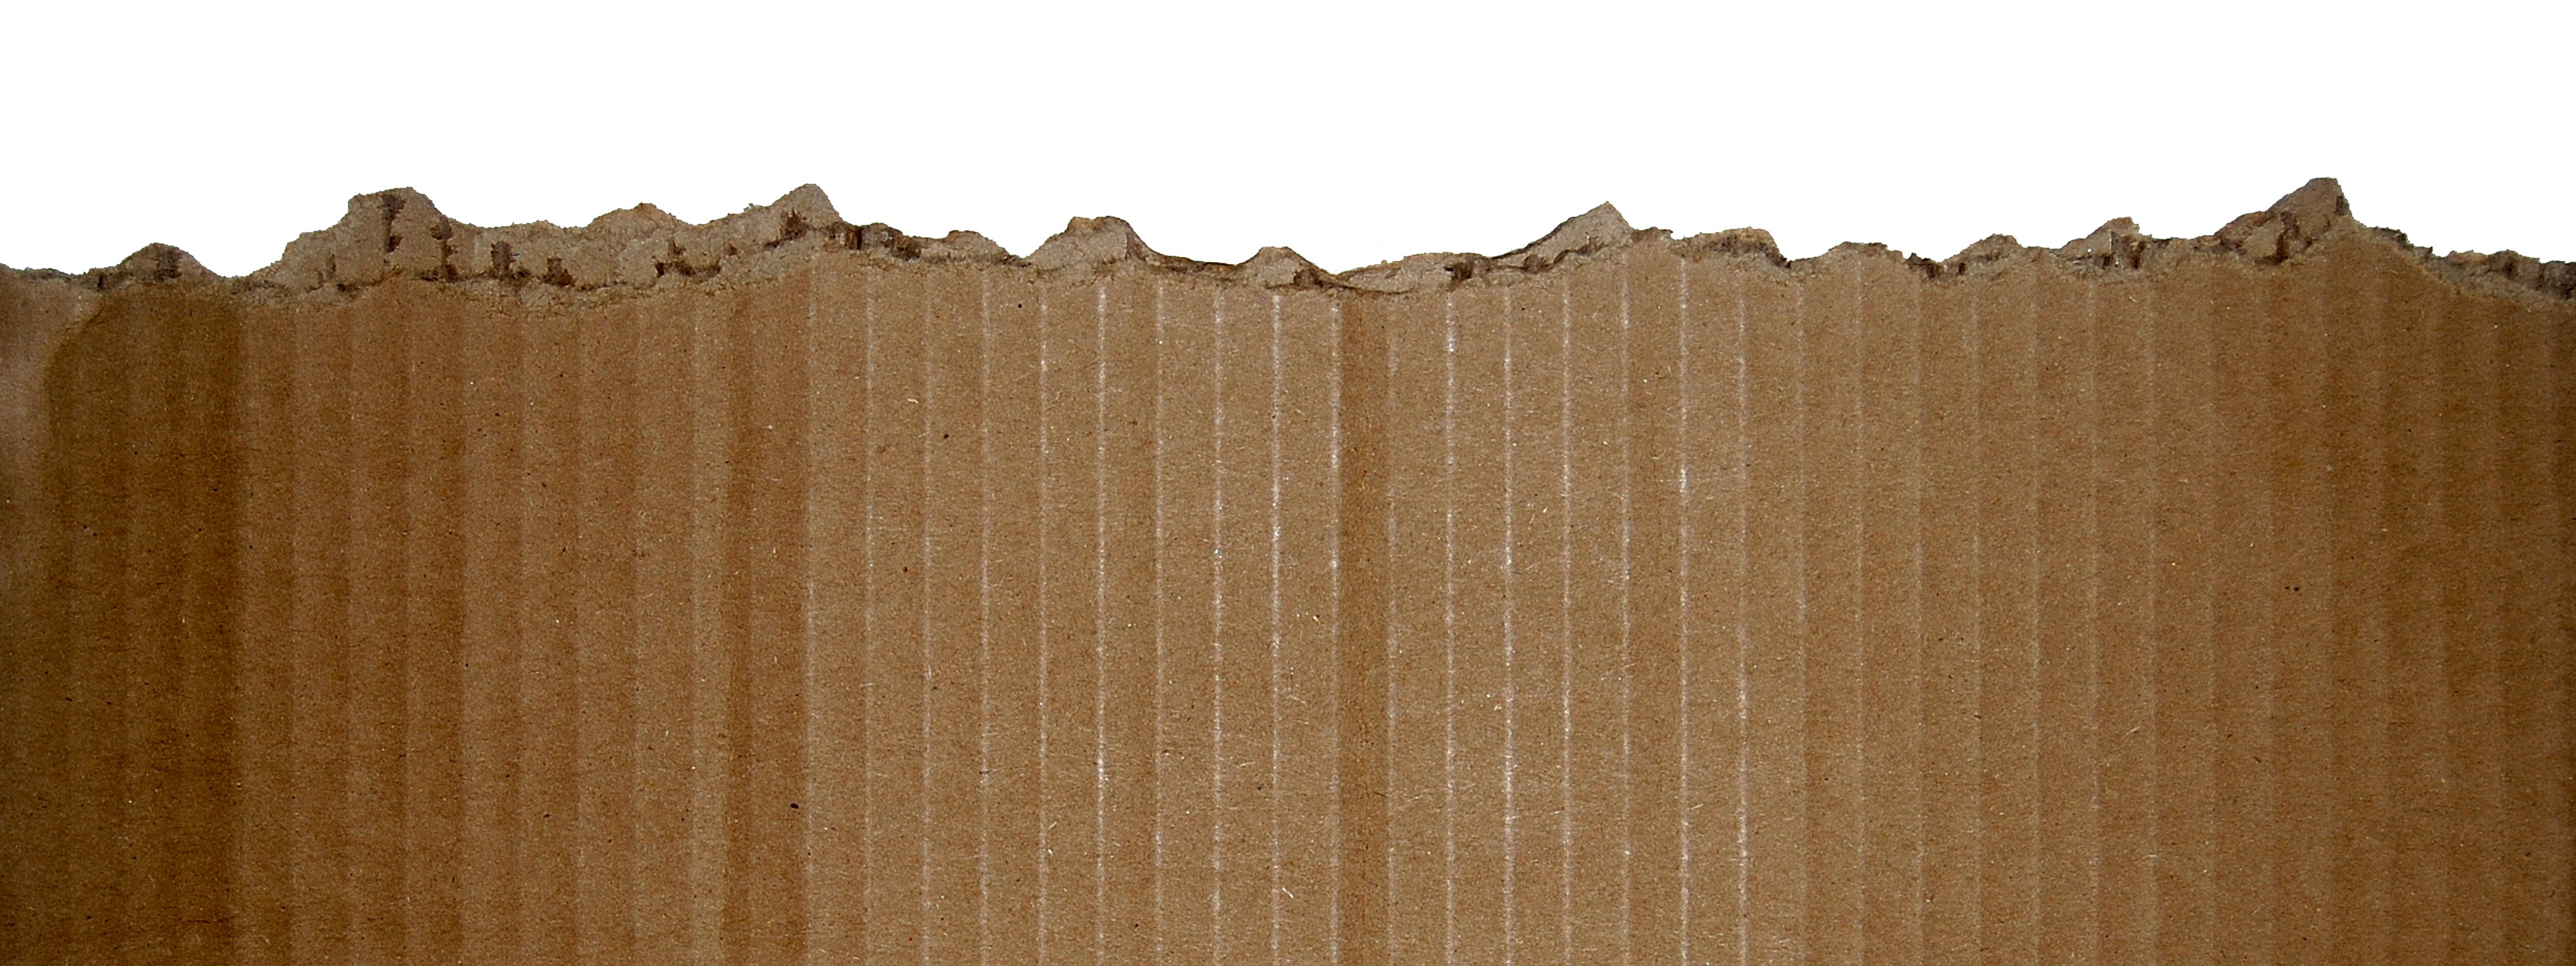 2015-11-27_07_cardboard_top_edge_rough_pappe_karton